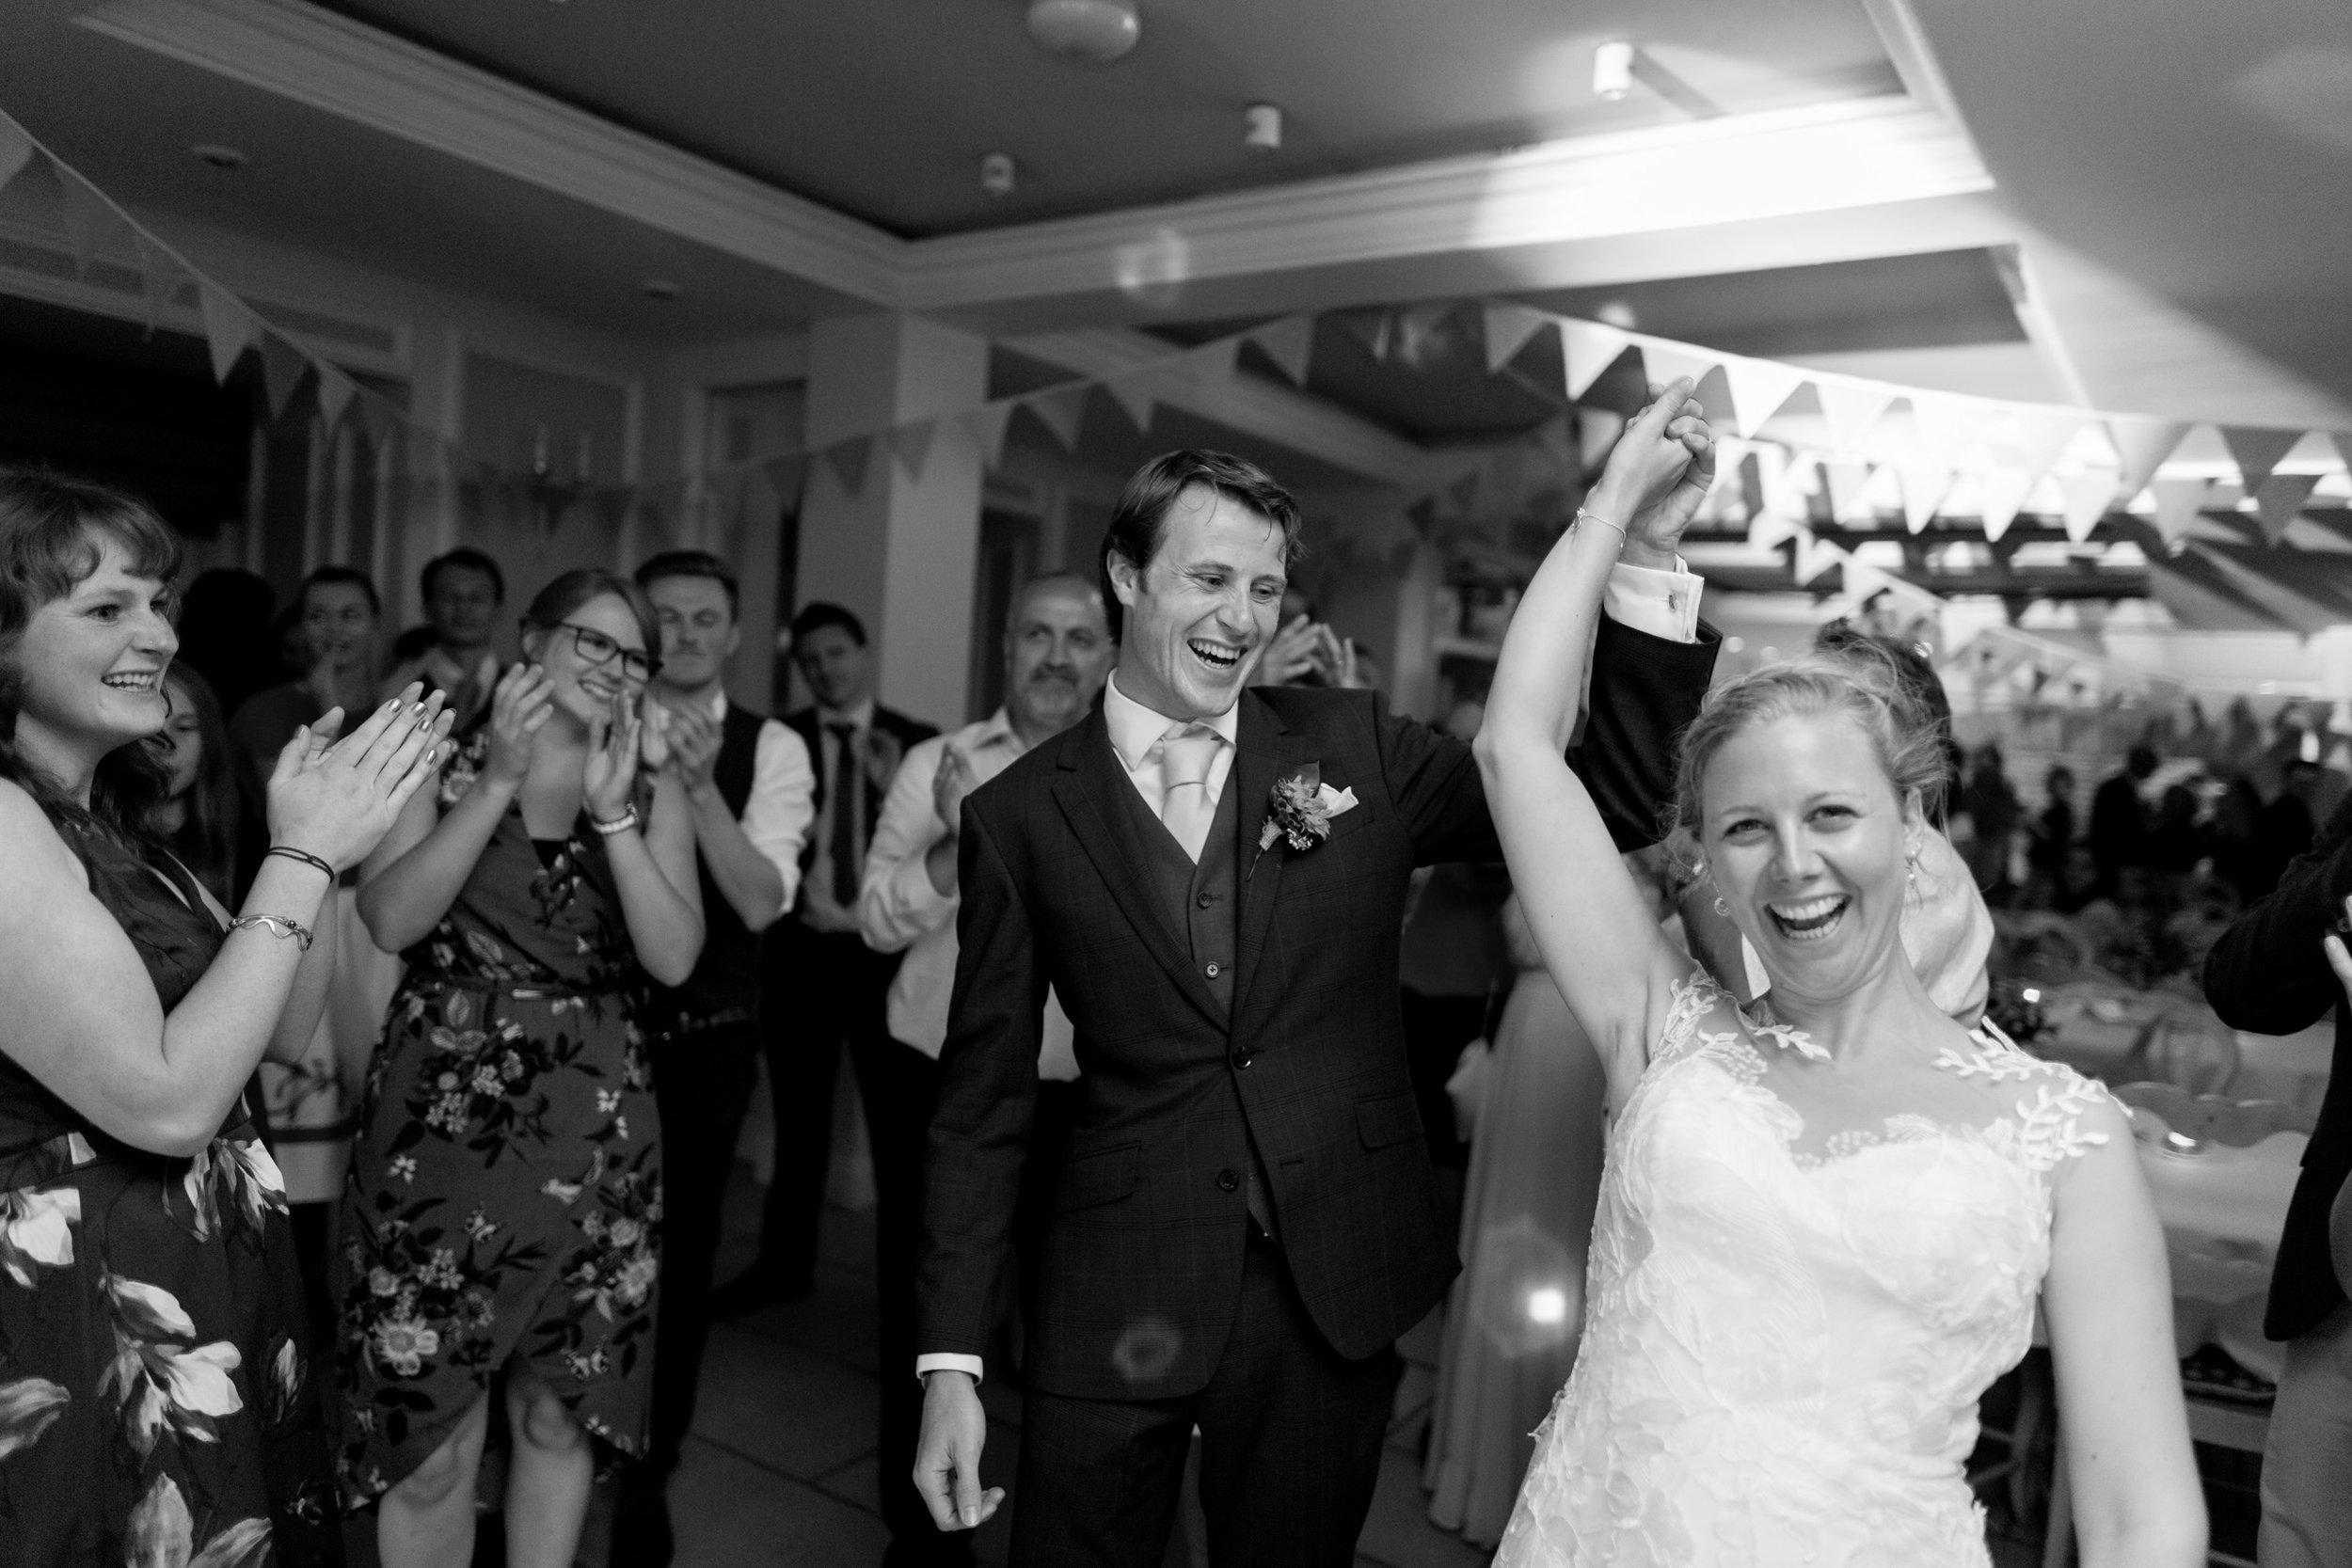 Bucklands-Tout-Saints-Hotel-Devon-Wedding-Photography-47.jpg